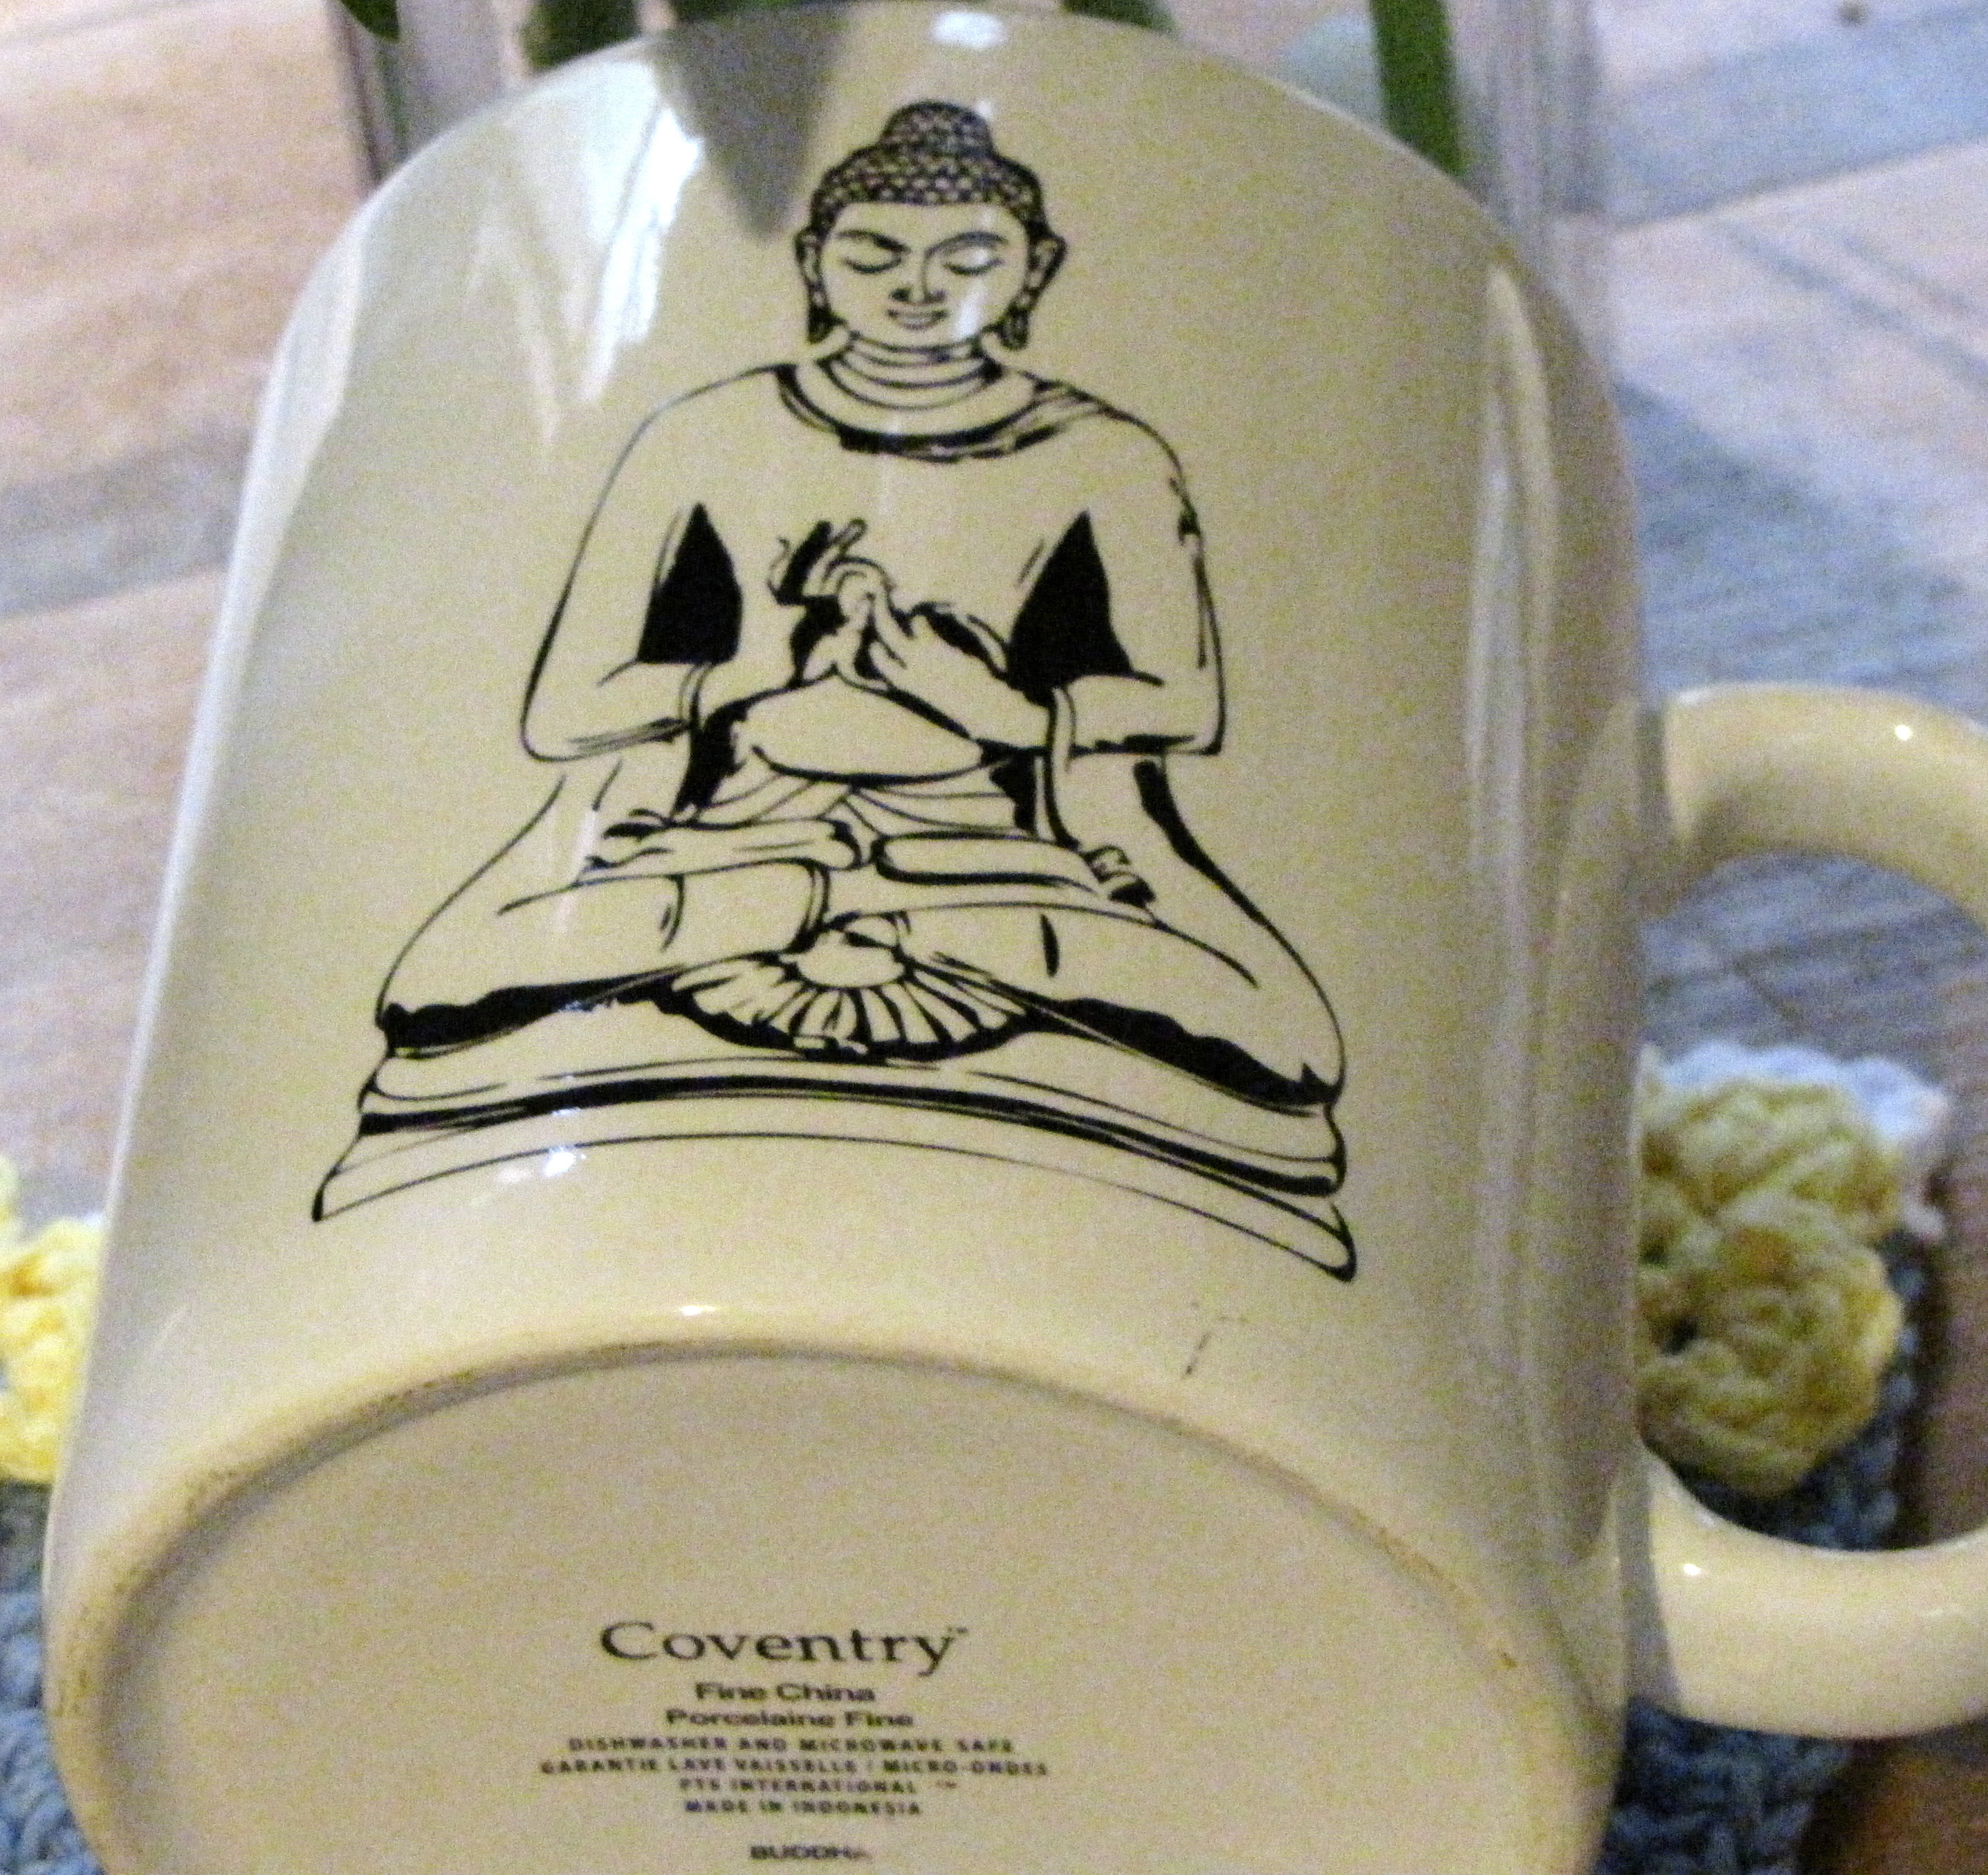 Kensington Buddha Mug